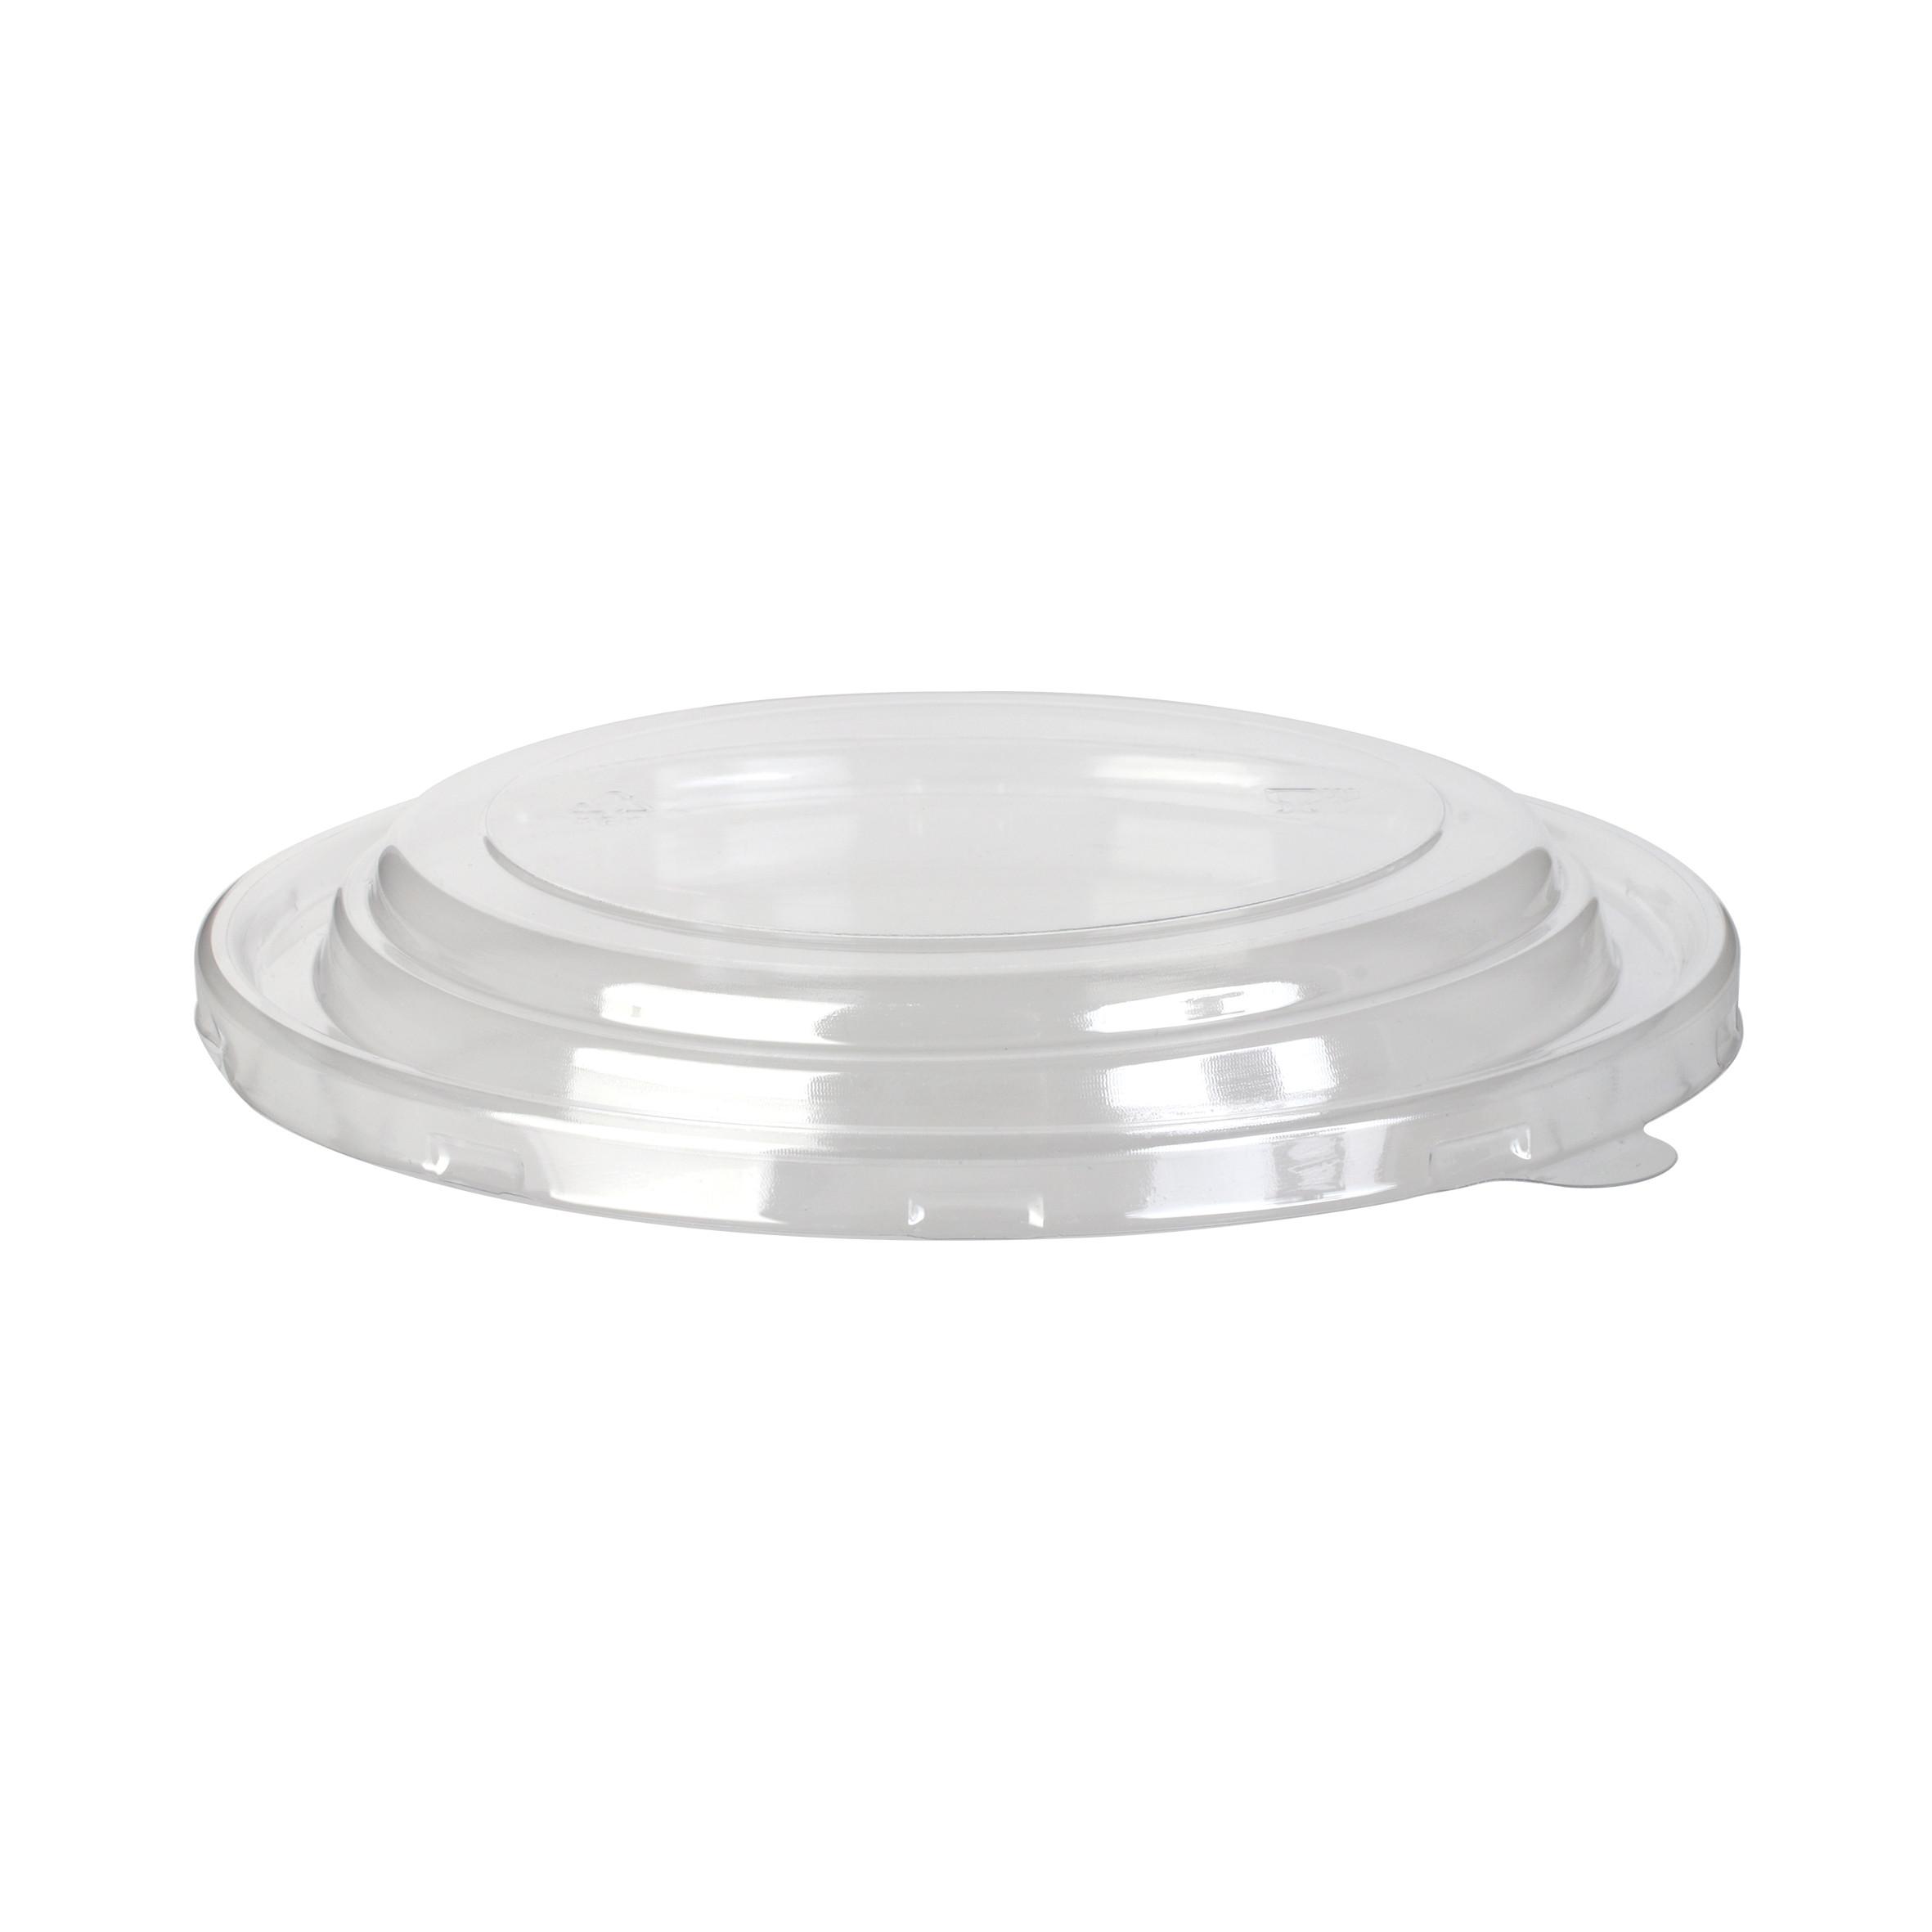 couvercle-pour-bol-carton-1300-ml